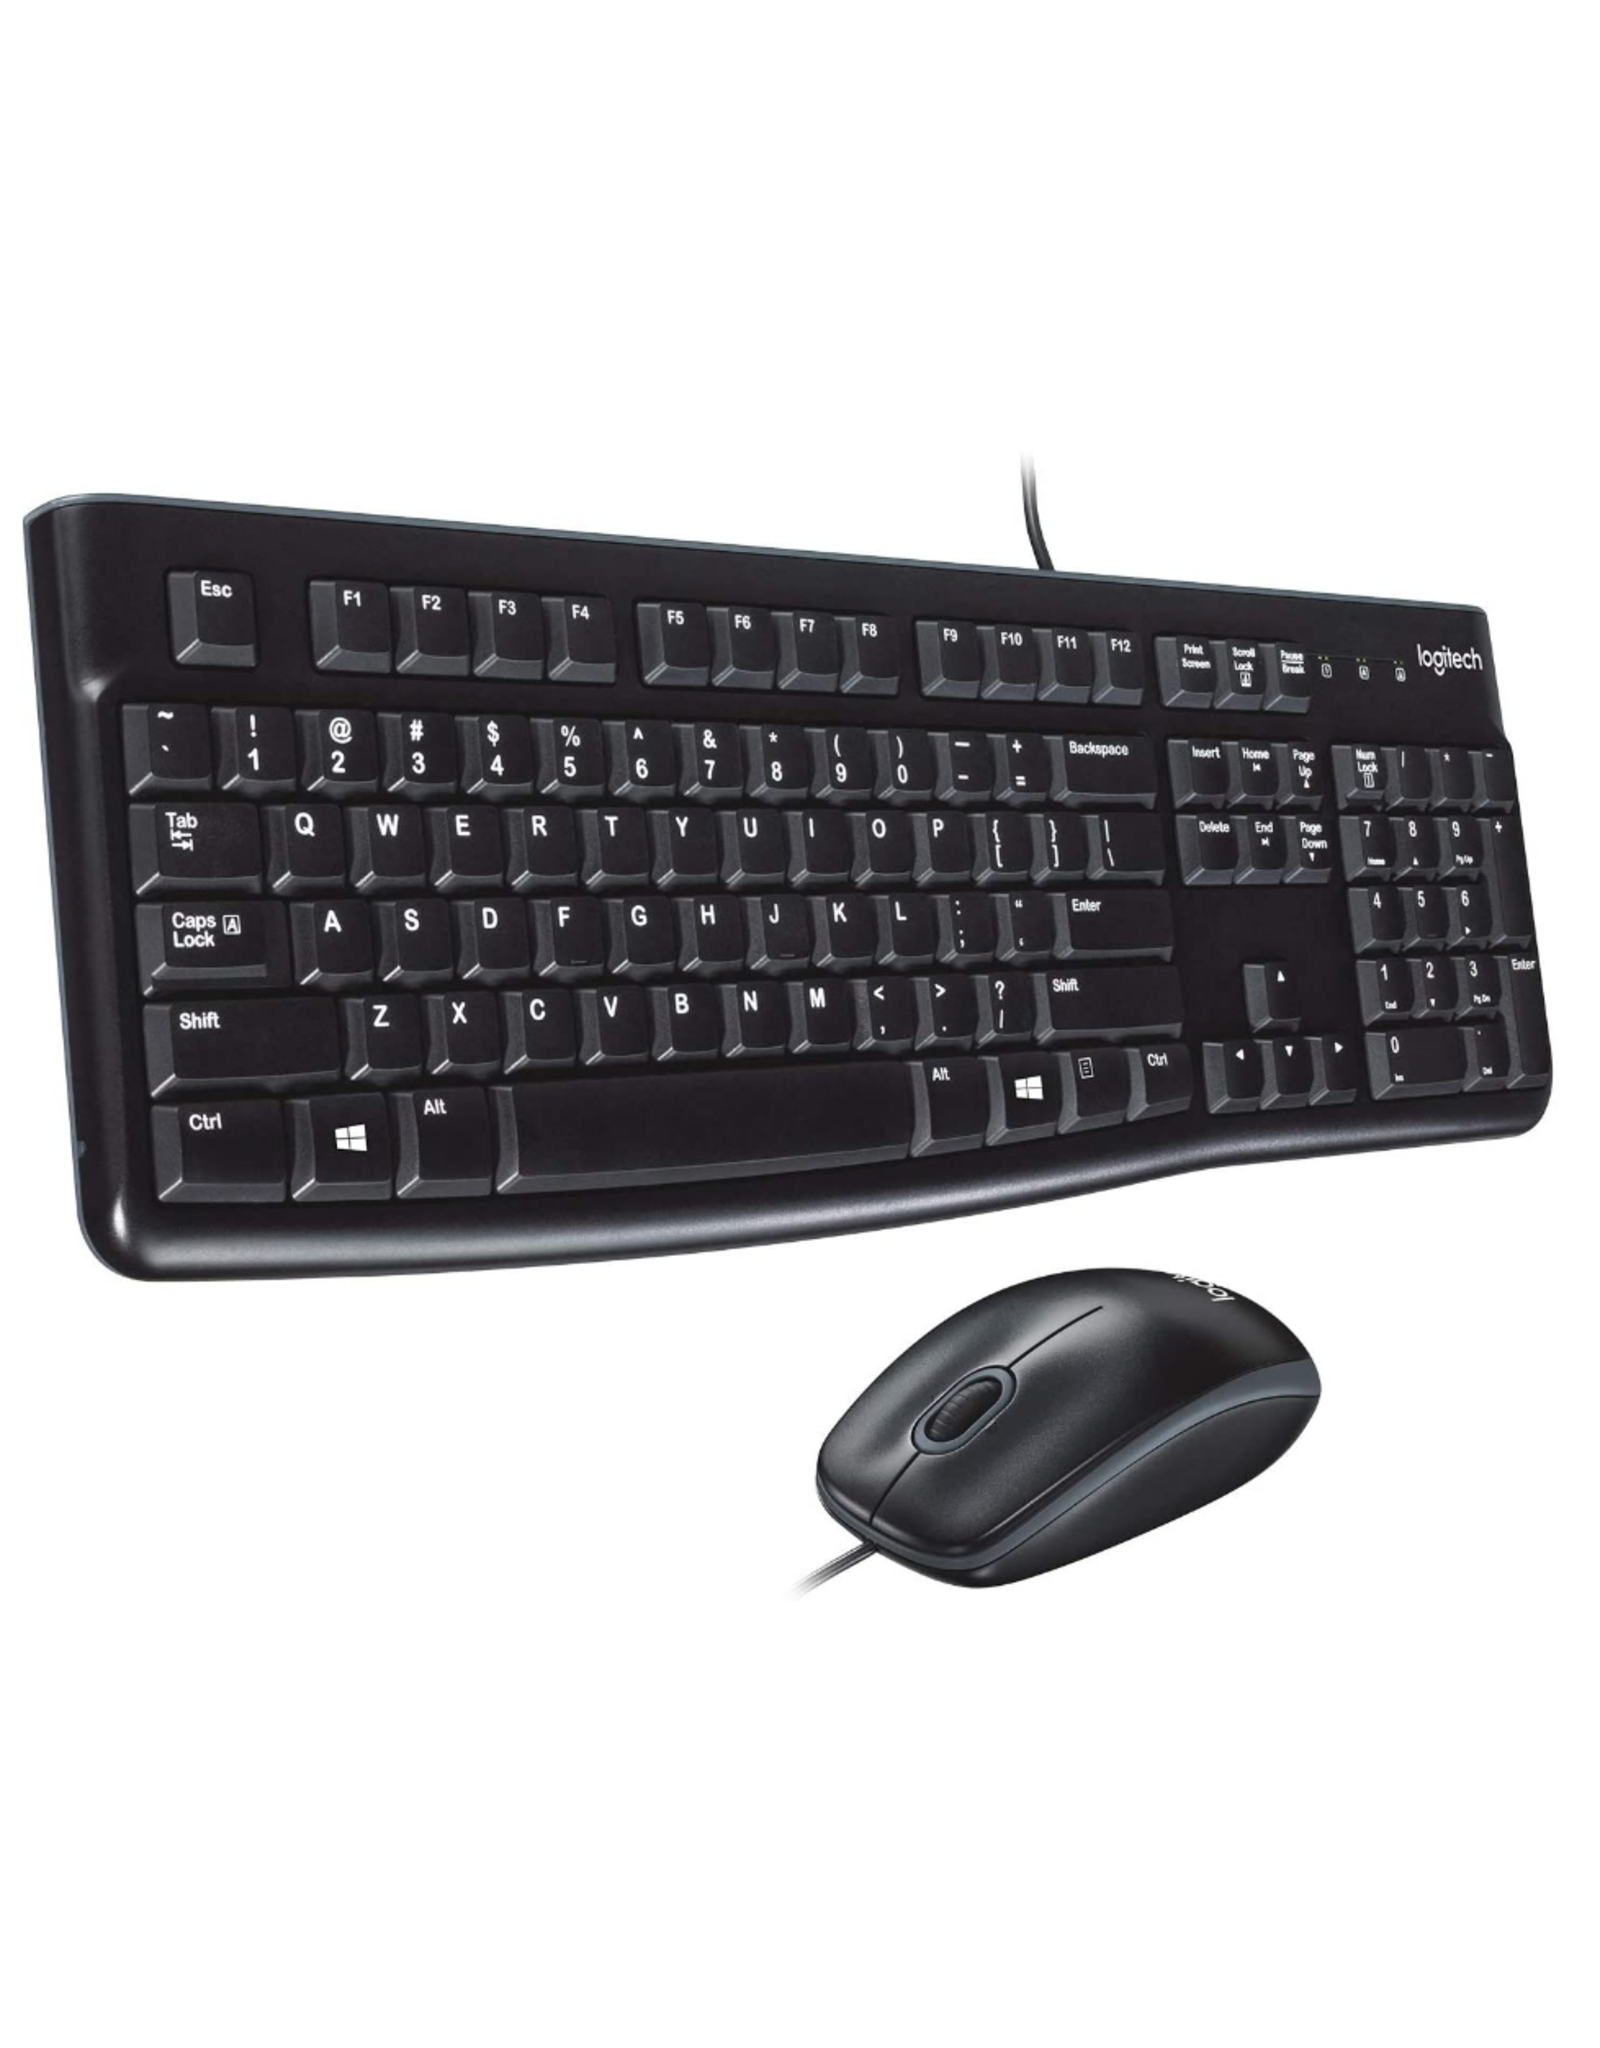 Logitech Logitech MK120 Desktop Keyboard and Mouse Combo USB - Black